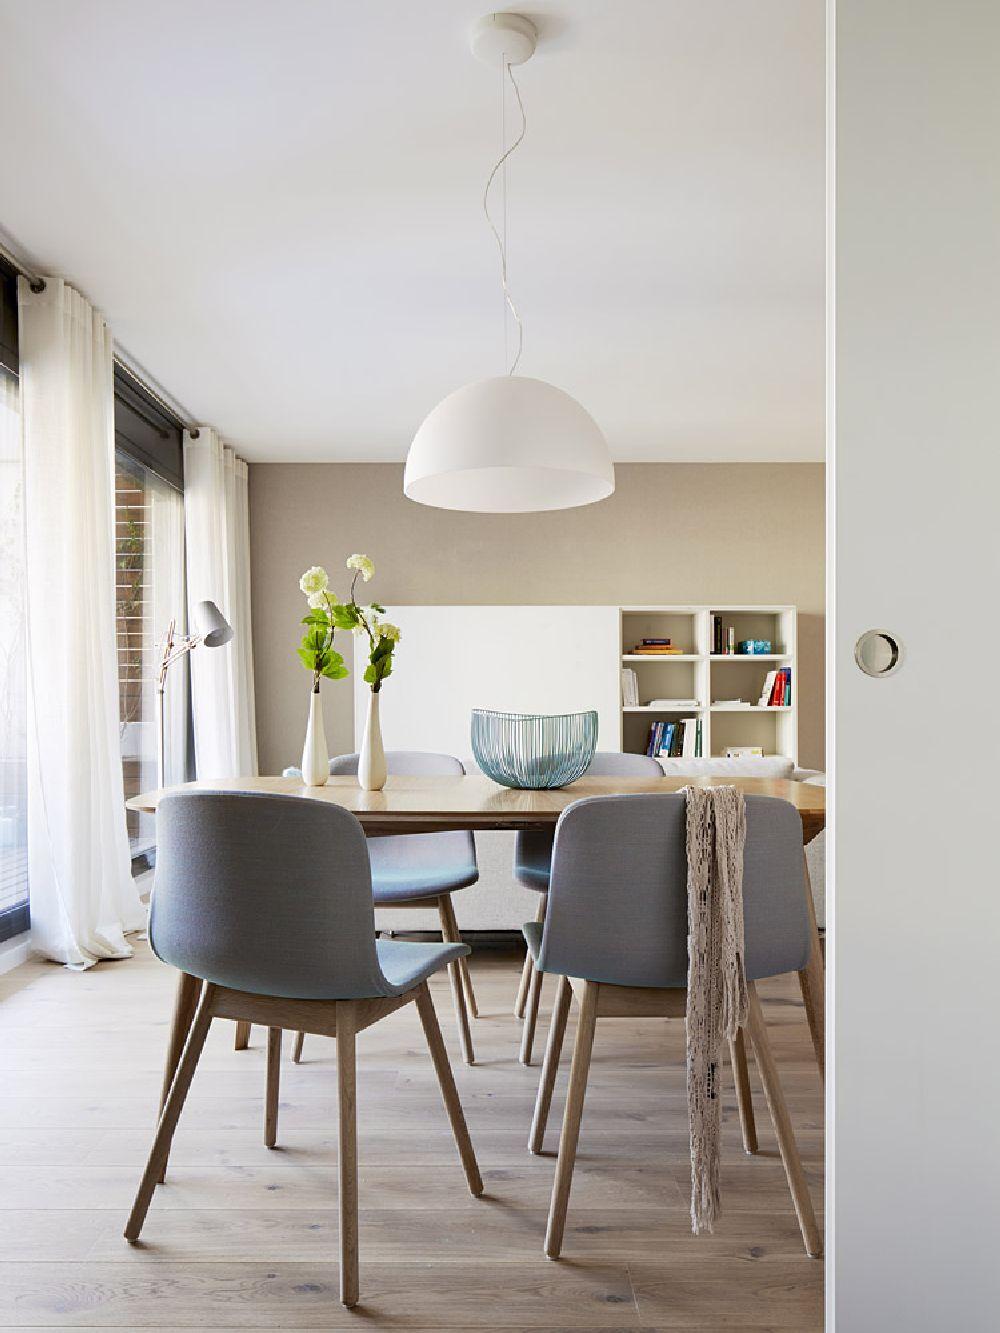 adelaparvu.com despre apartament cu aer mediteranean, design interior Meritxell Ribe (4)